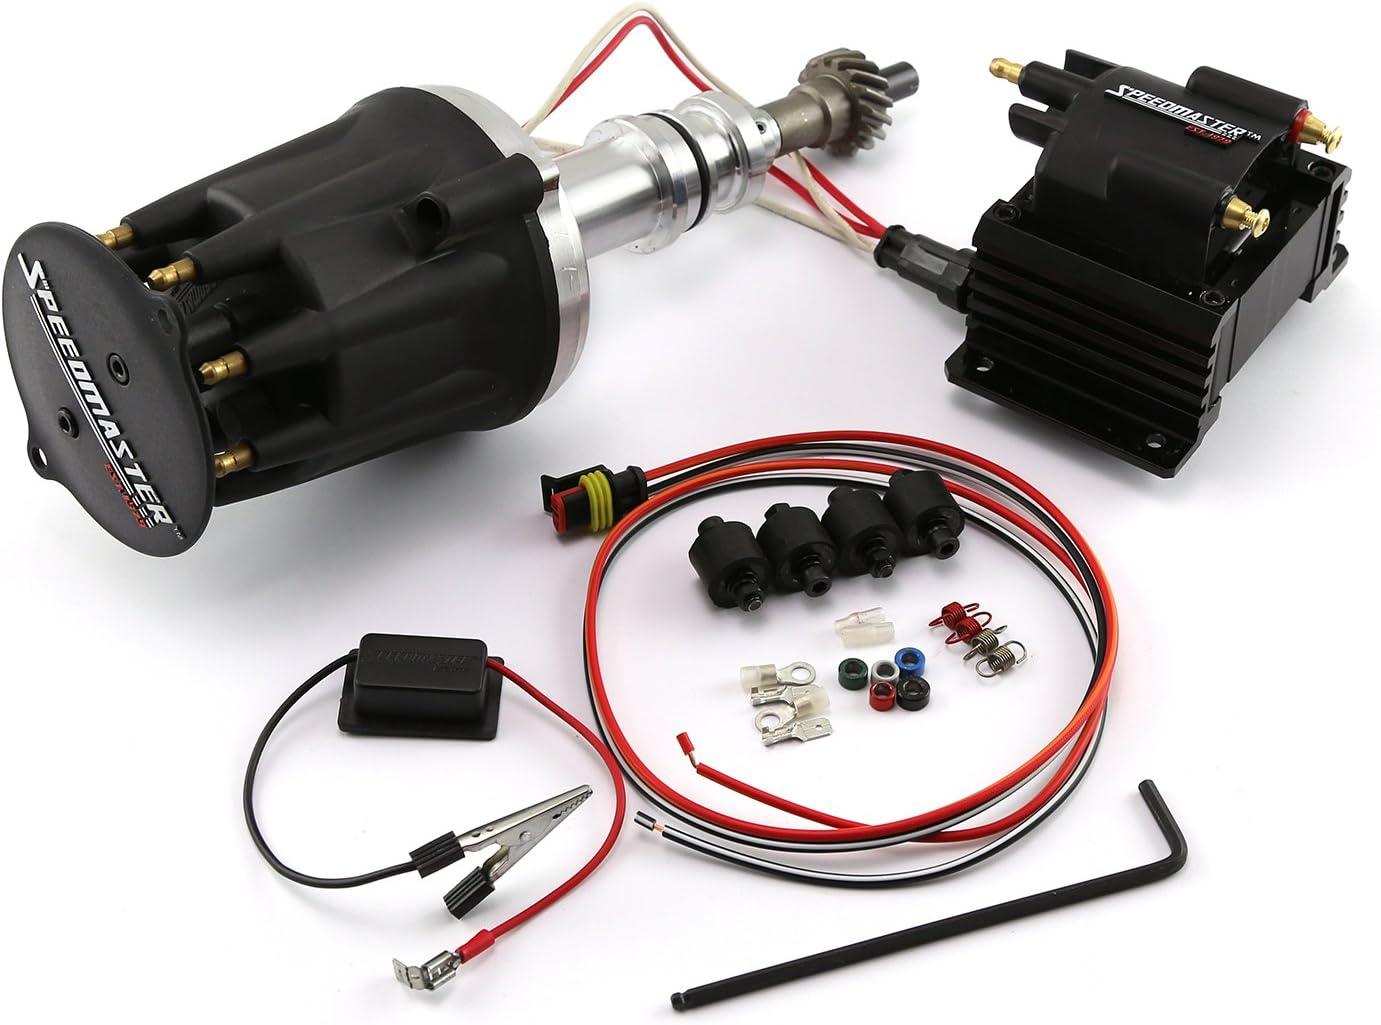 Speedmaster 1-385-004 Discount is also underway Fits Ford 302 351C - Rayo 460 El Popular overseas Cleveland